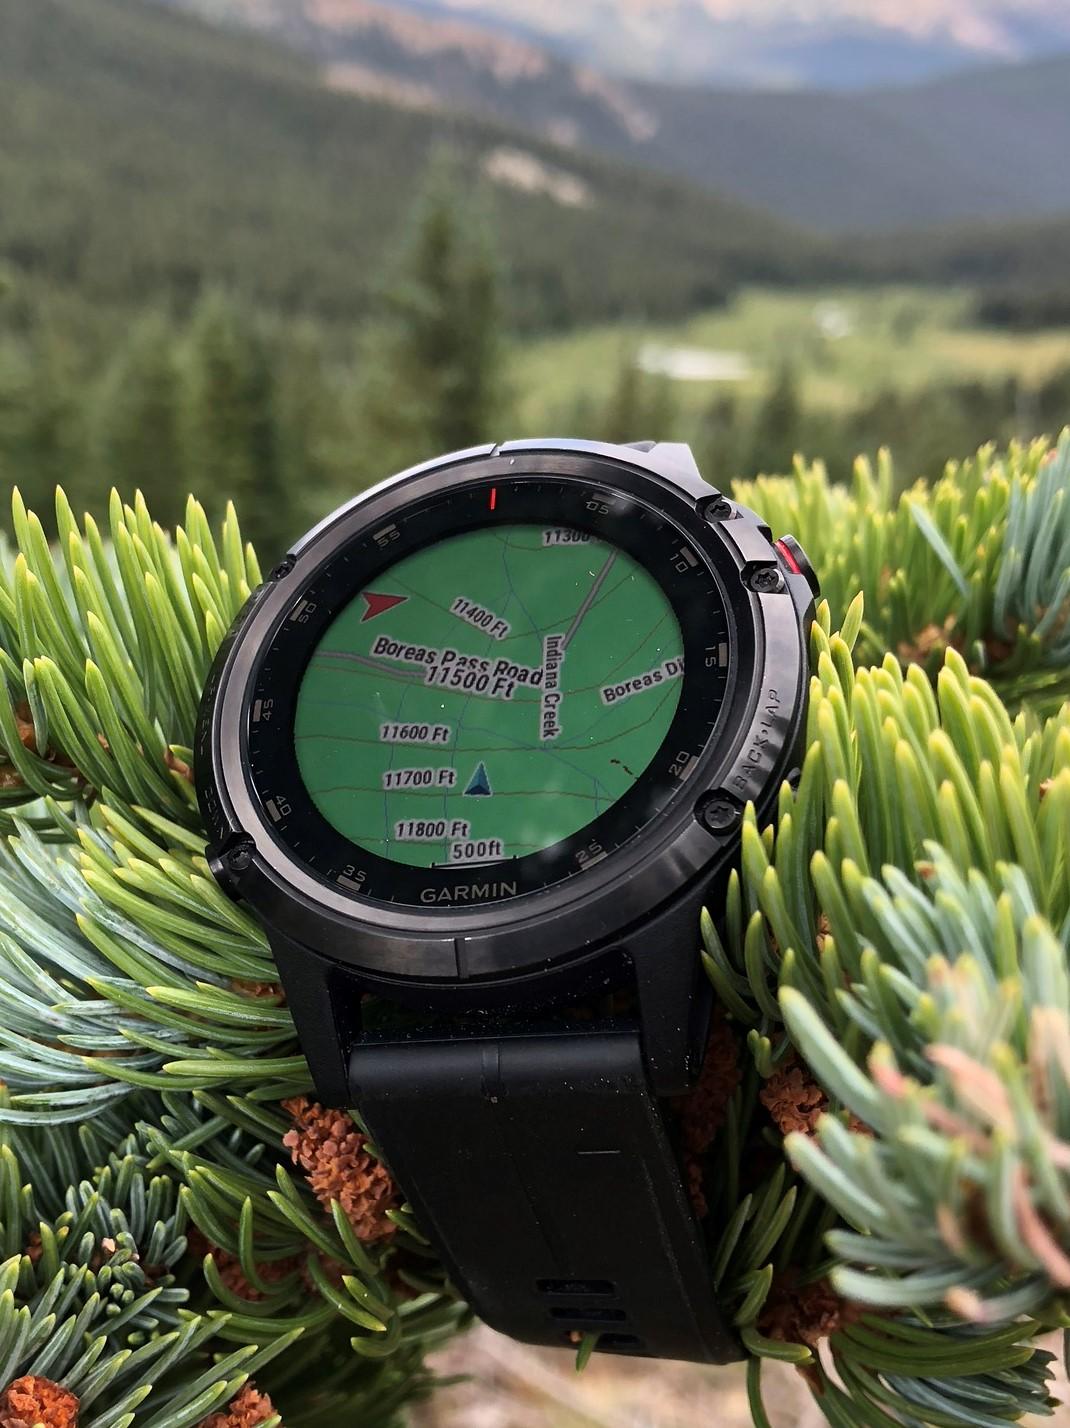 Road Trail Run: Garmin Fenix 5 Plus Full Review - The Ultimate